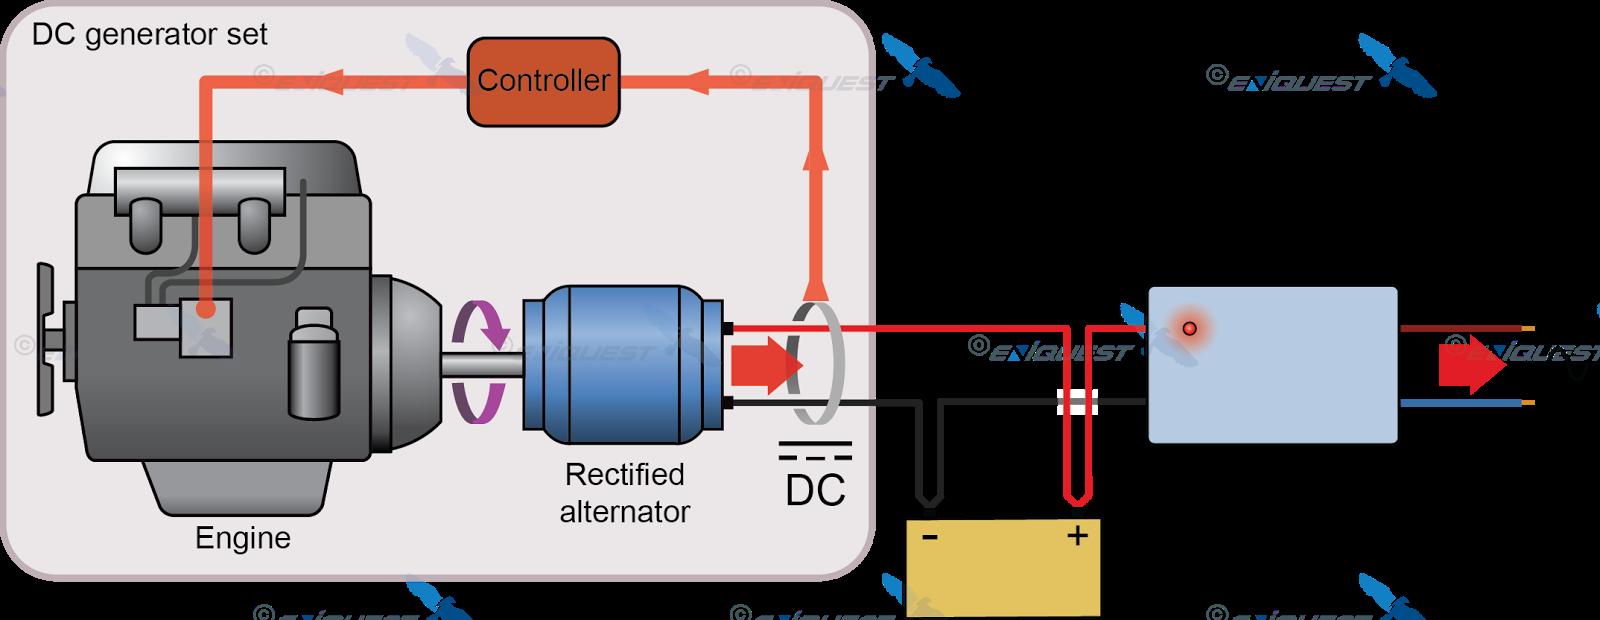 WRG-4699] Dc Alternator Generator Wiring Diagram on